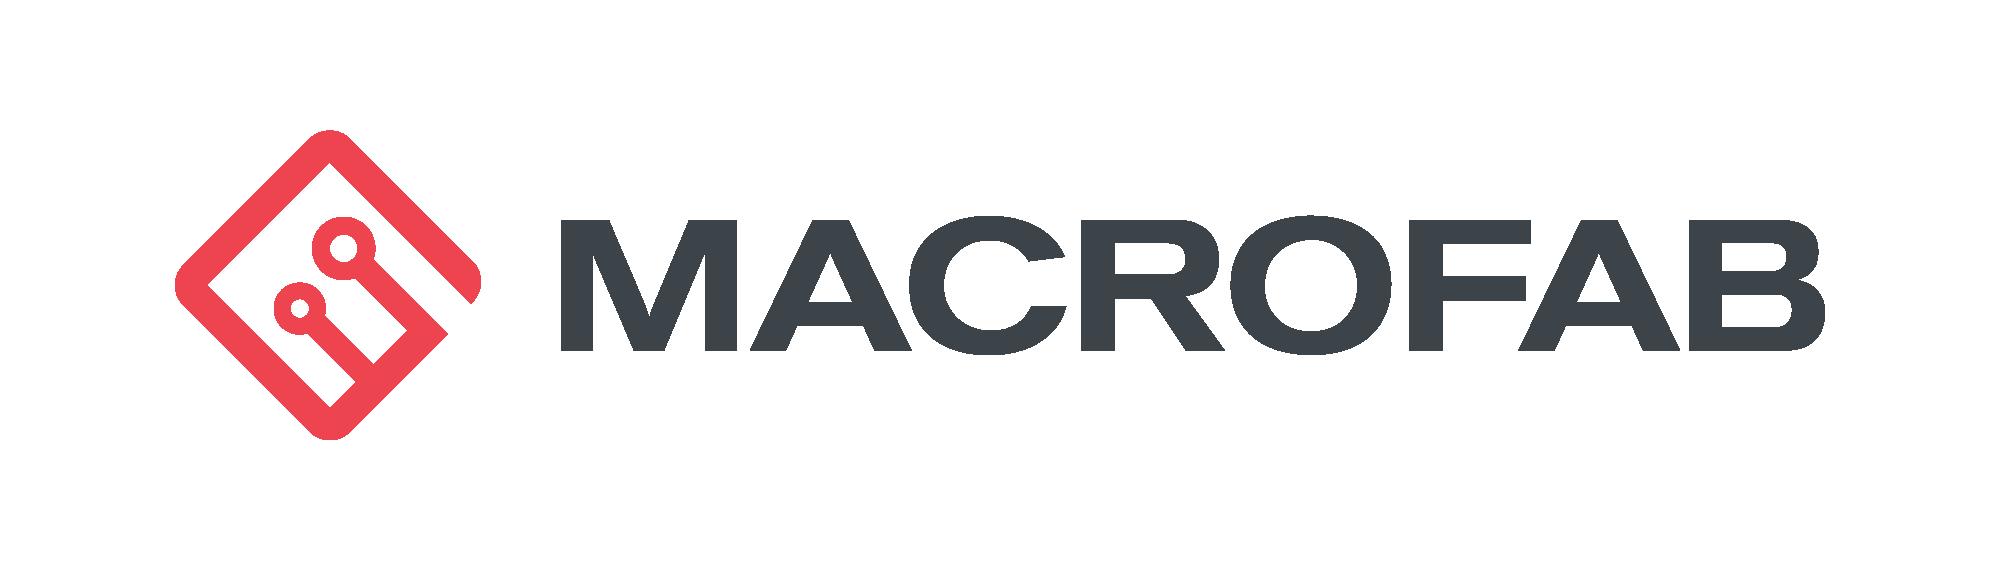 macrofab-primary-logo-large